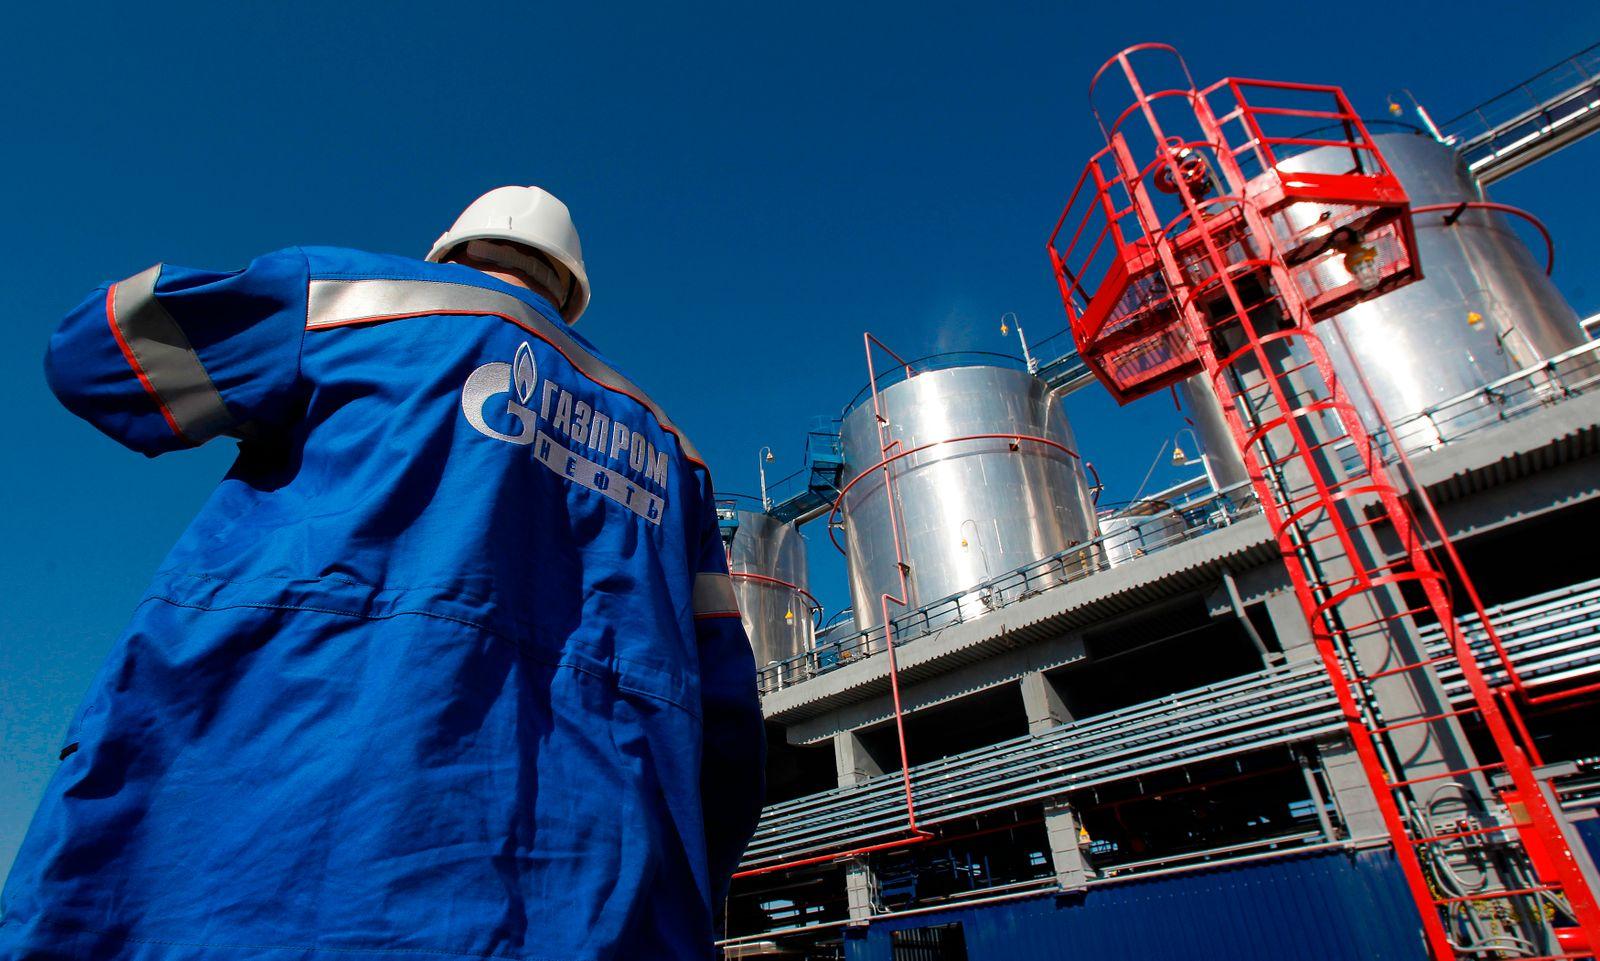 Gasprom / Gazprom